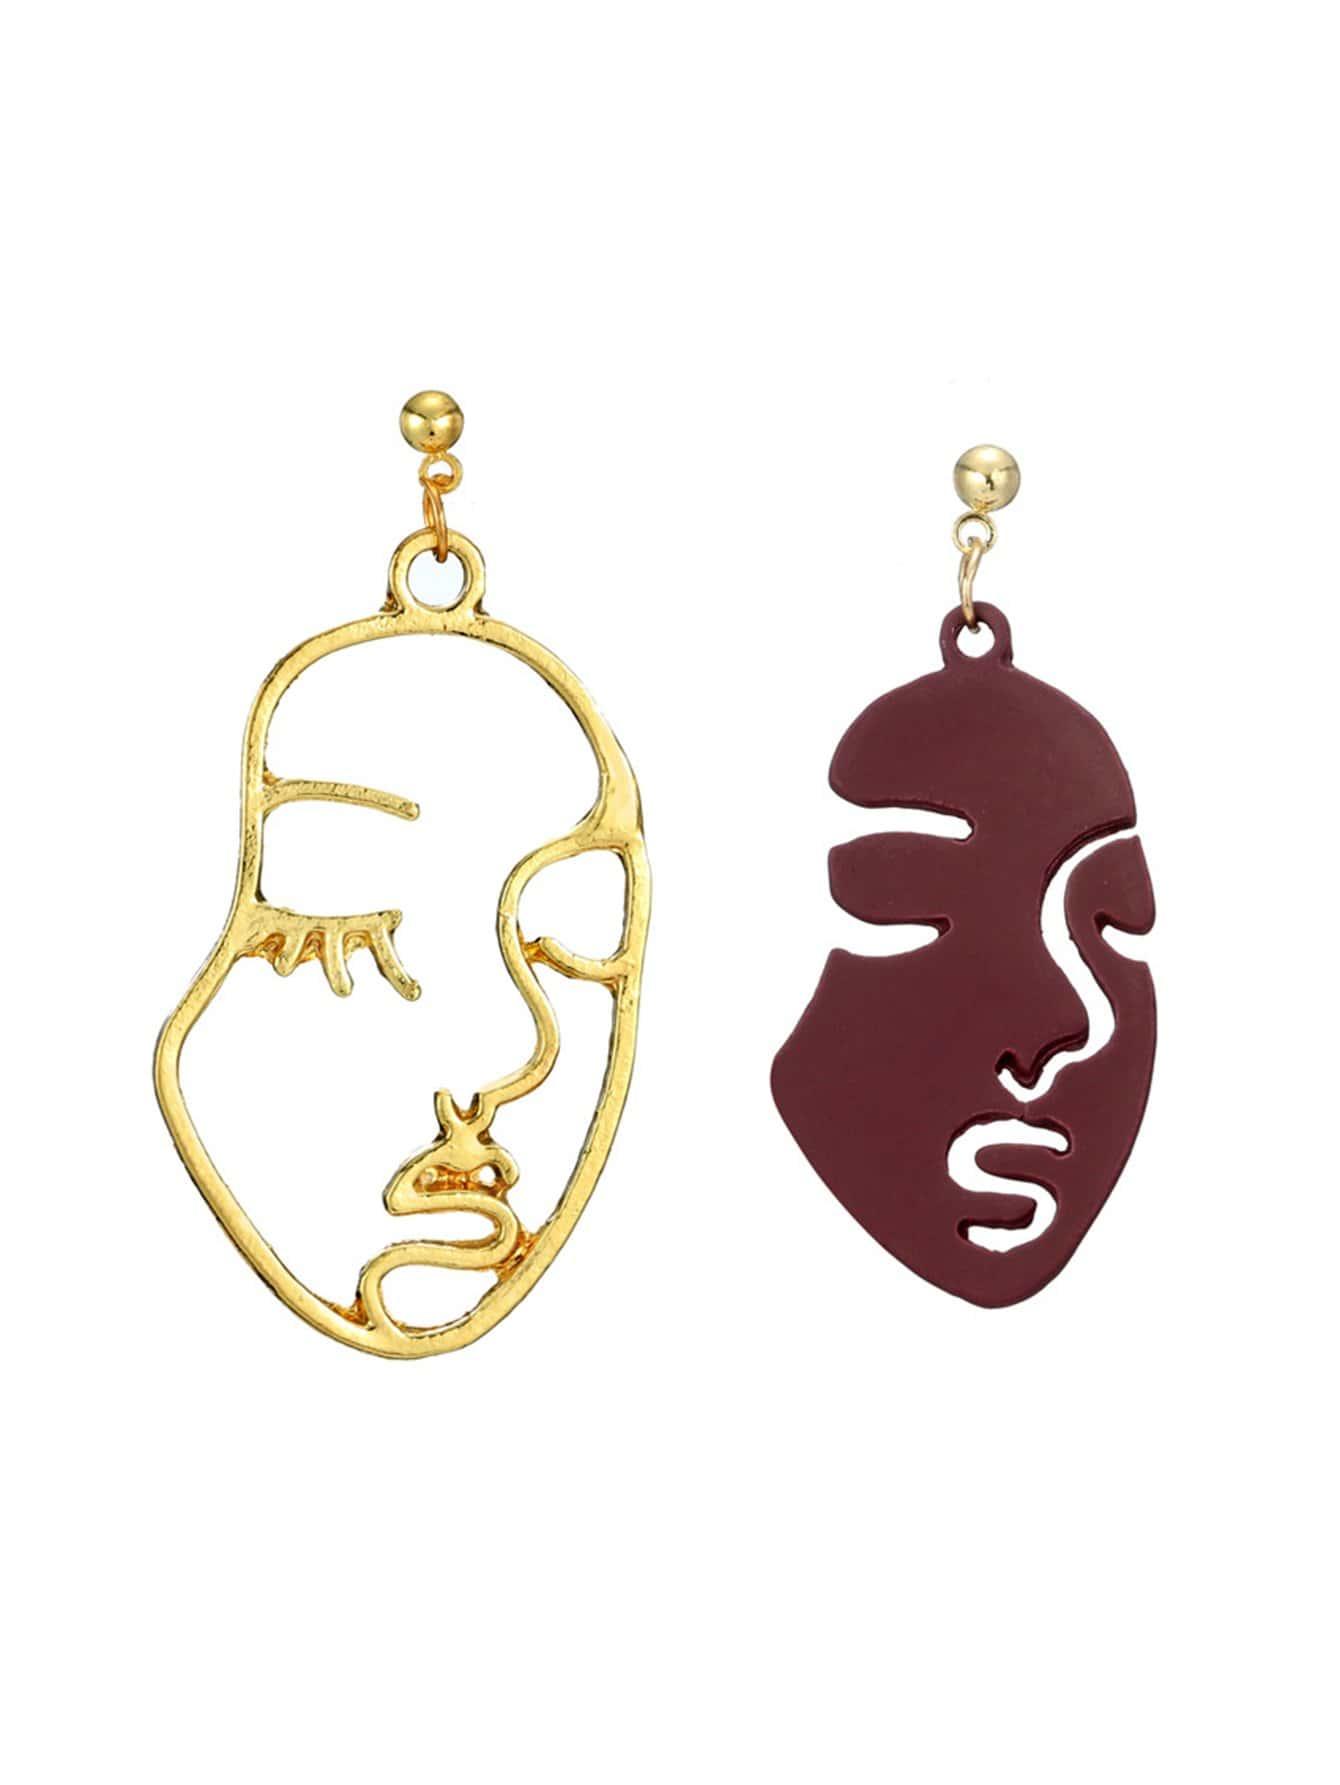 Open Face Drop Earrings гель лак для ногтей orly gel fx 484 цвет 484 liquid vinyl variant hex name 100e0f